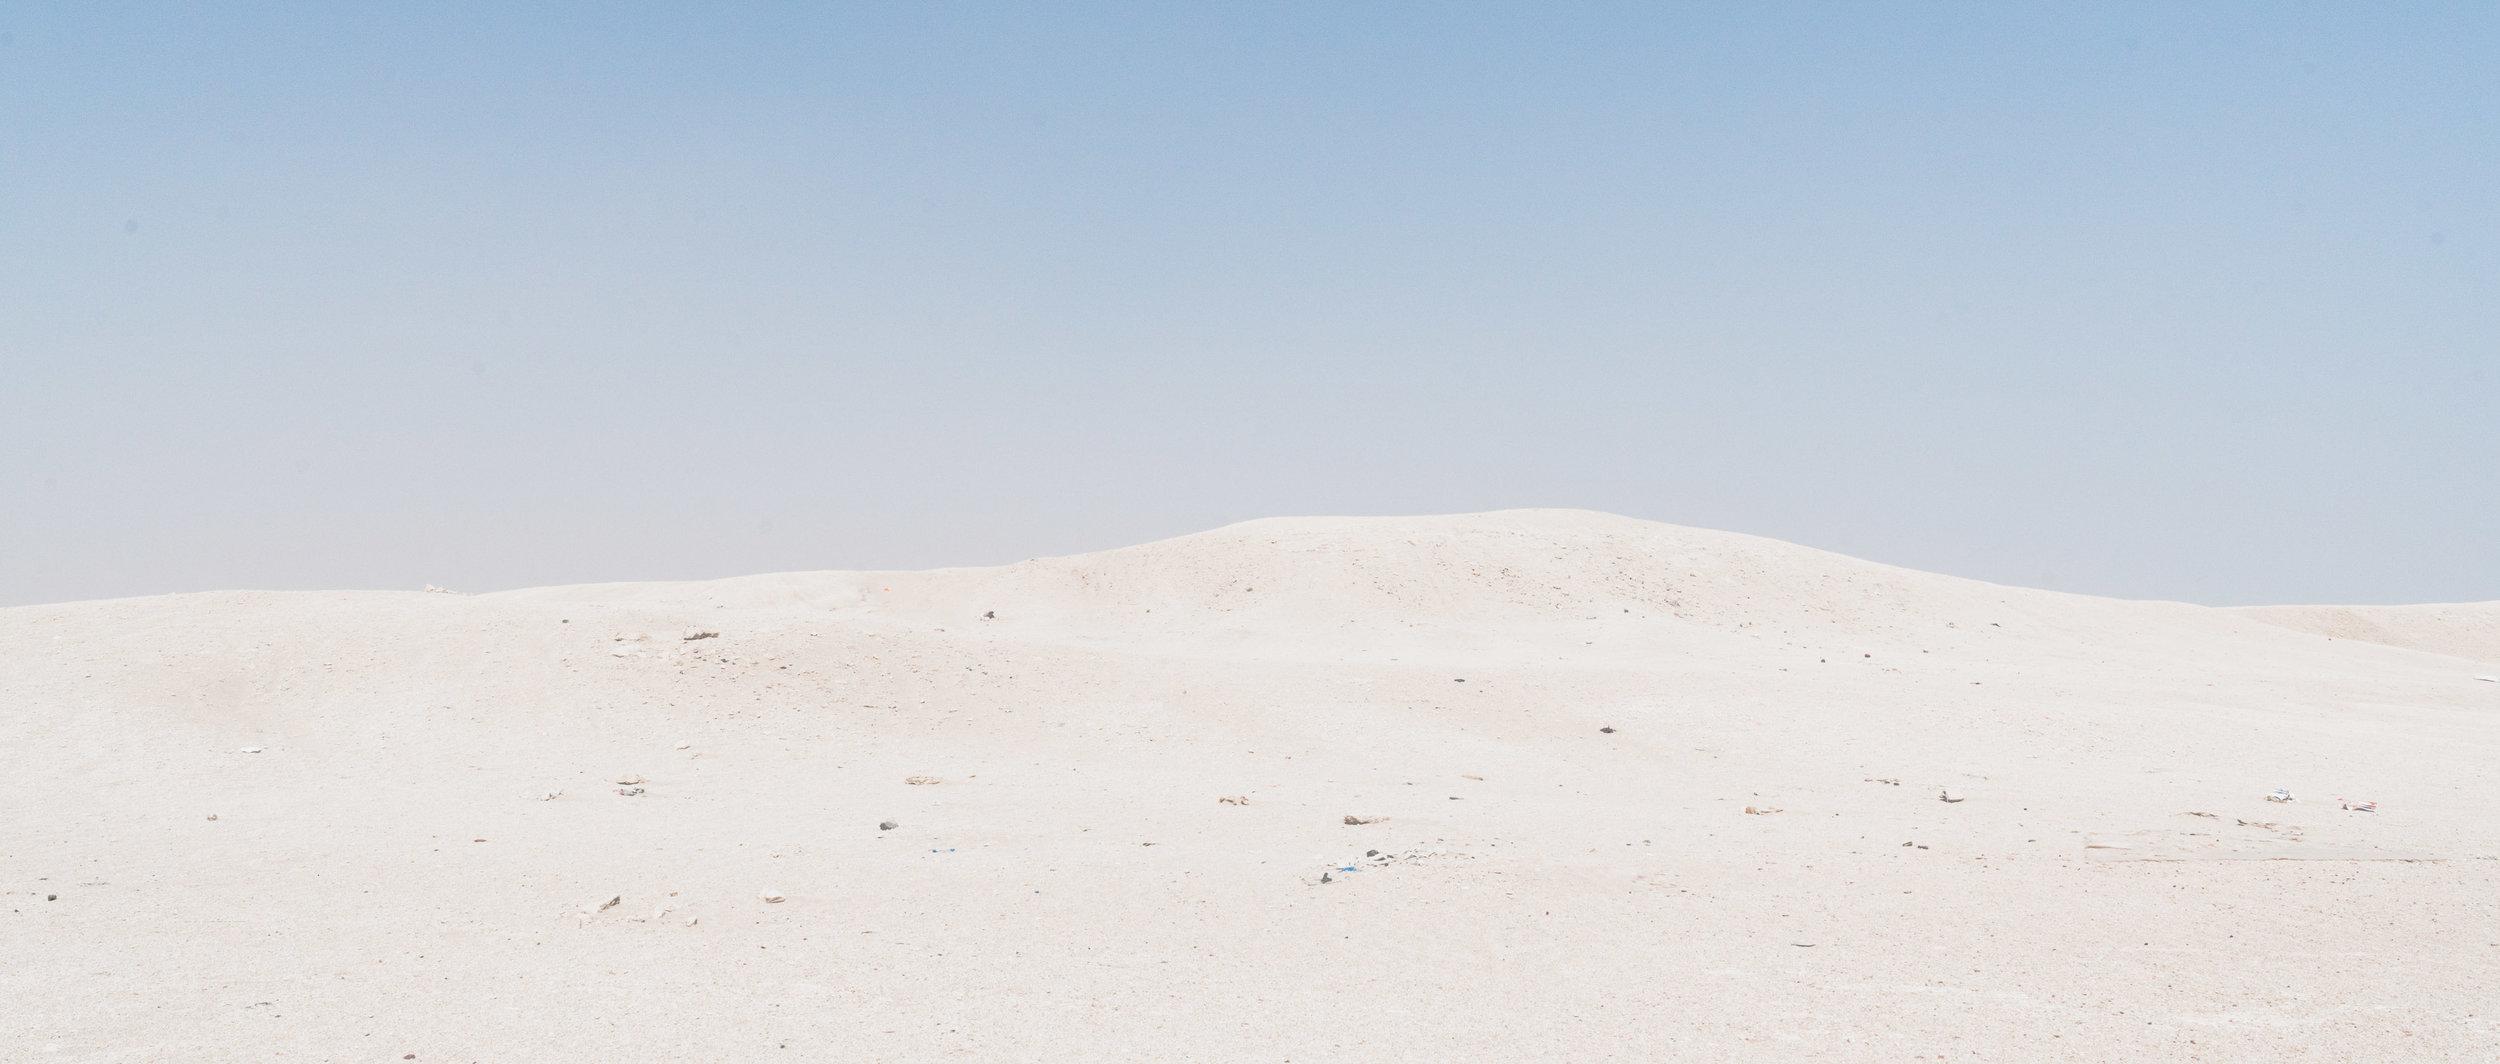 Kuwaiti Desert - Clean lines. Simple, low contrast image